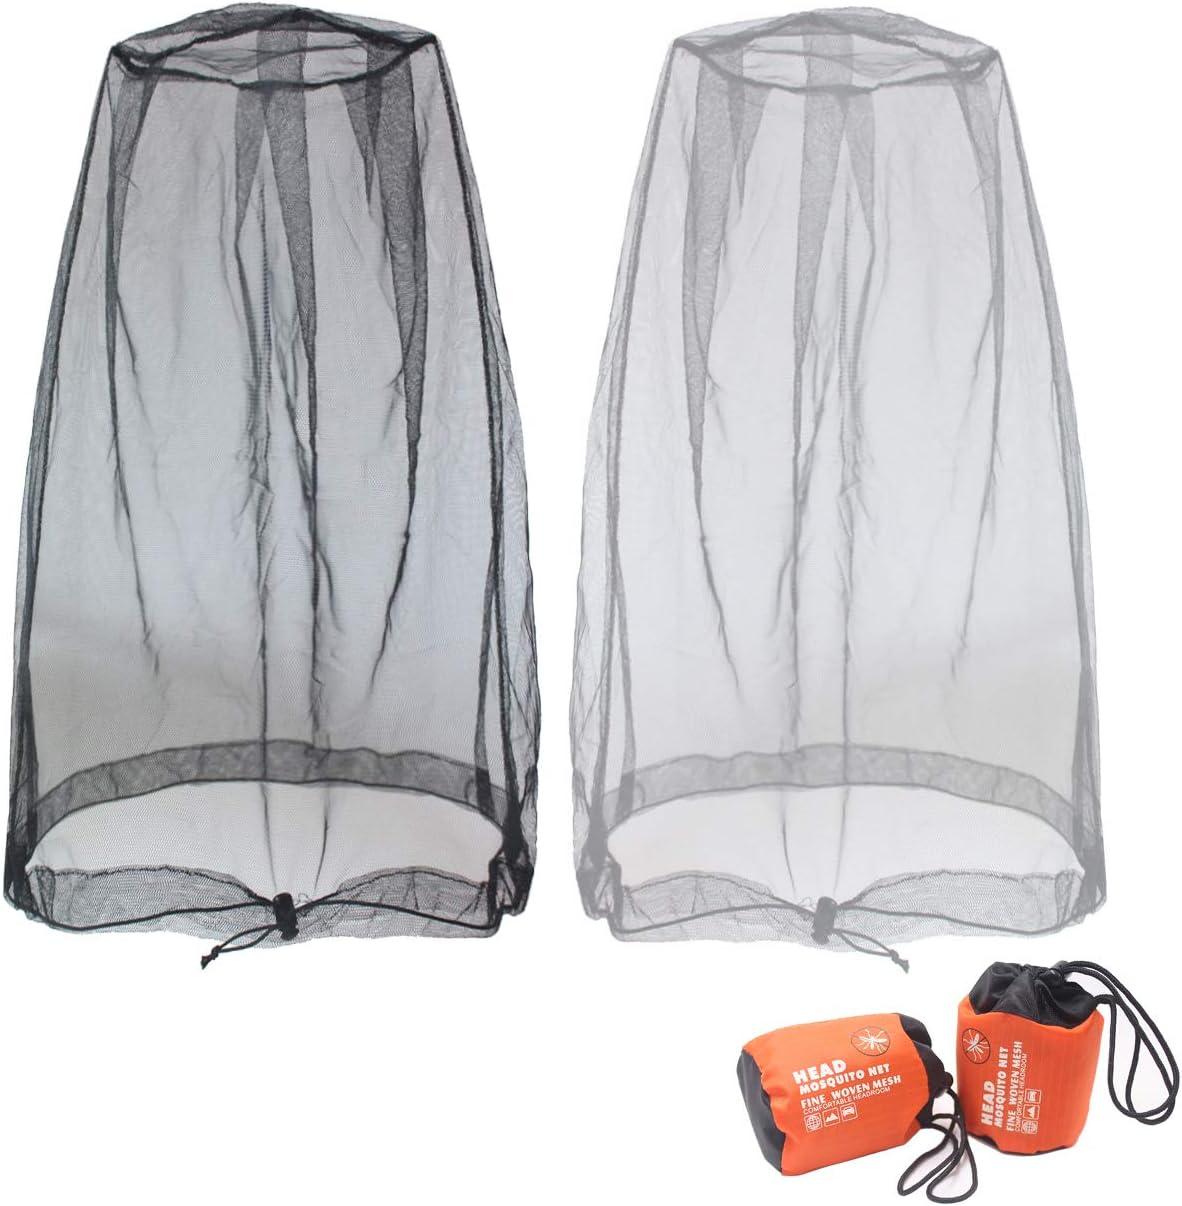 BENVO Mosquito Repellent Net